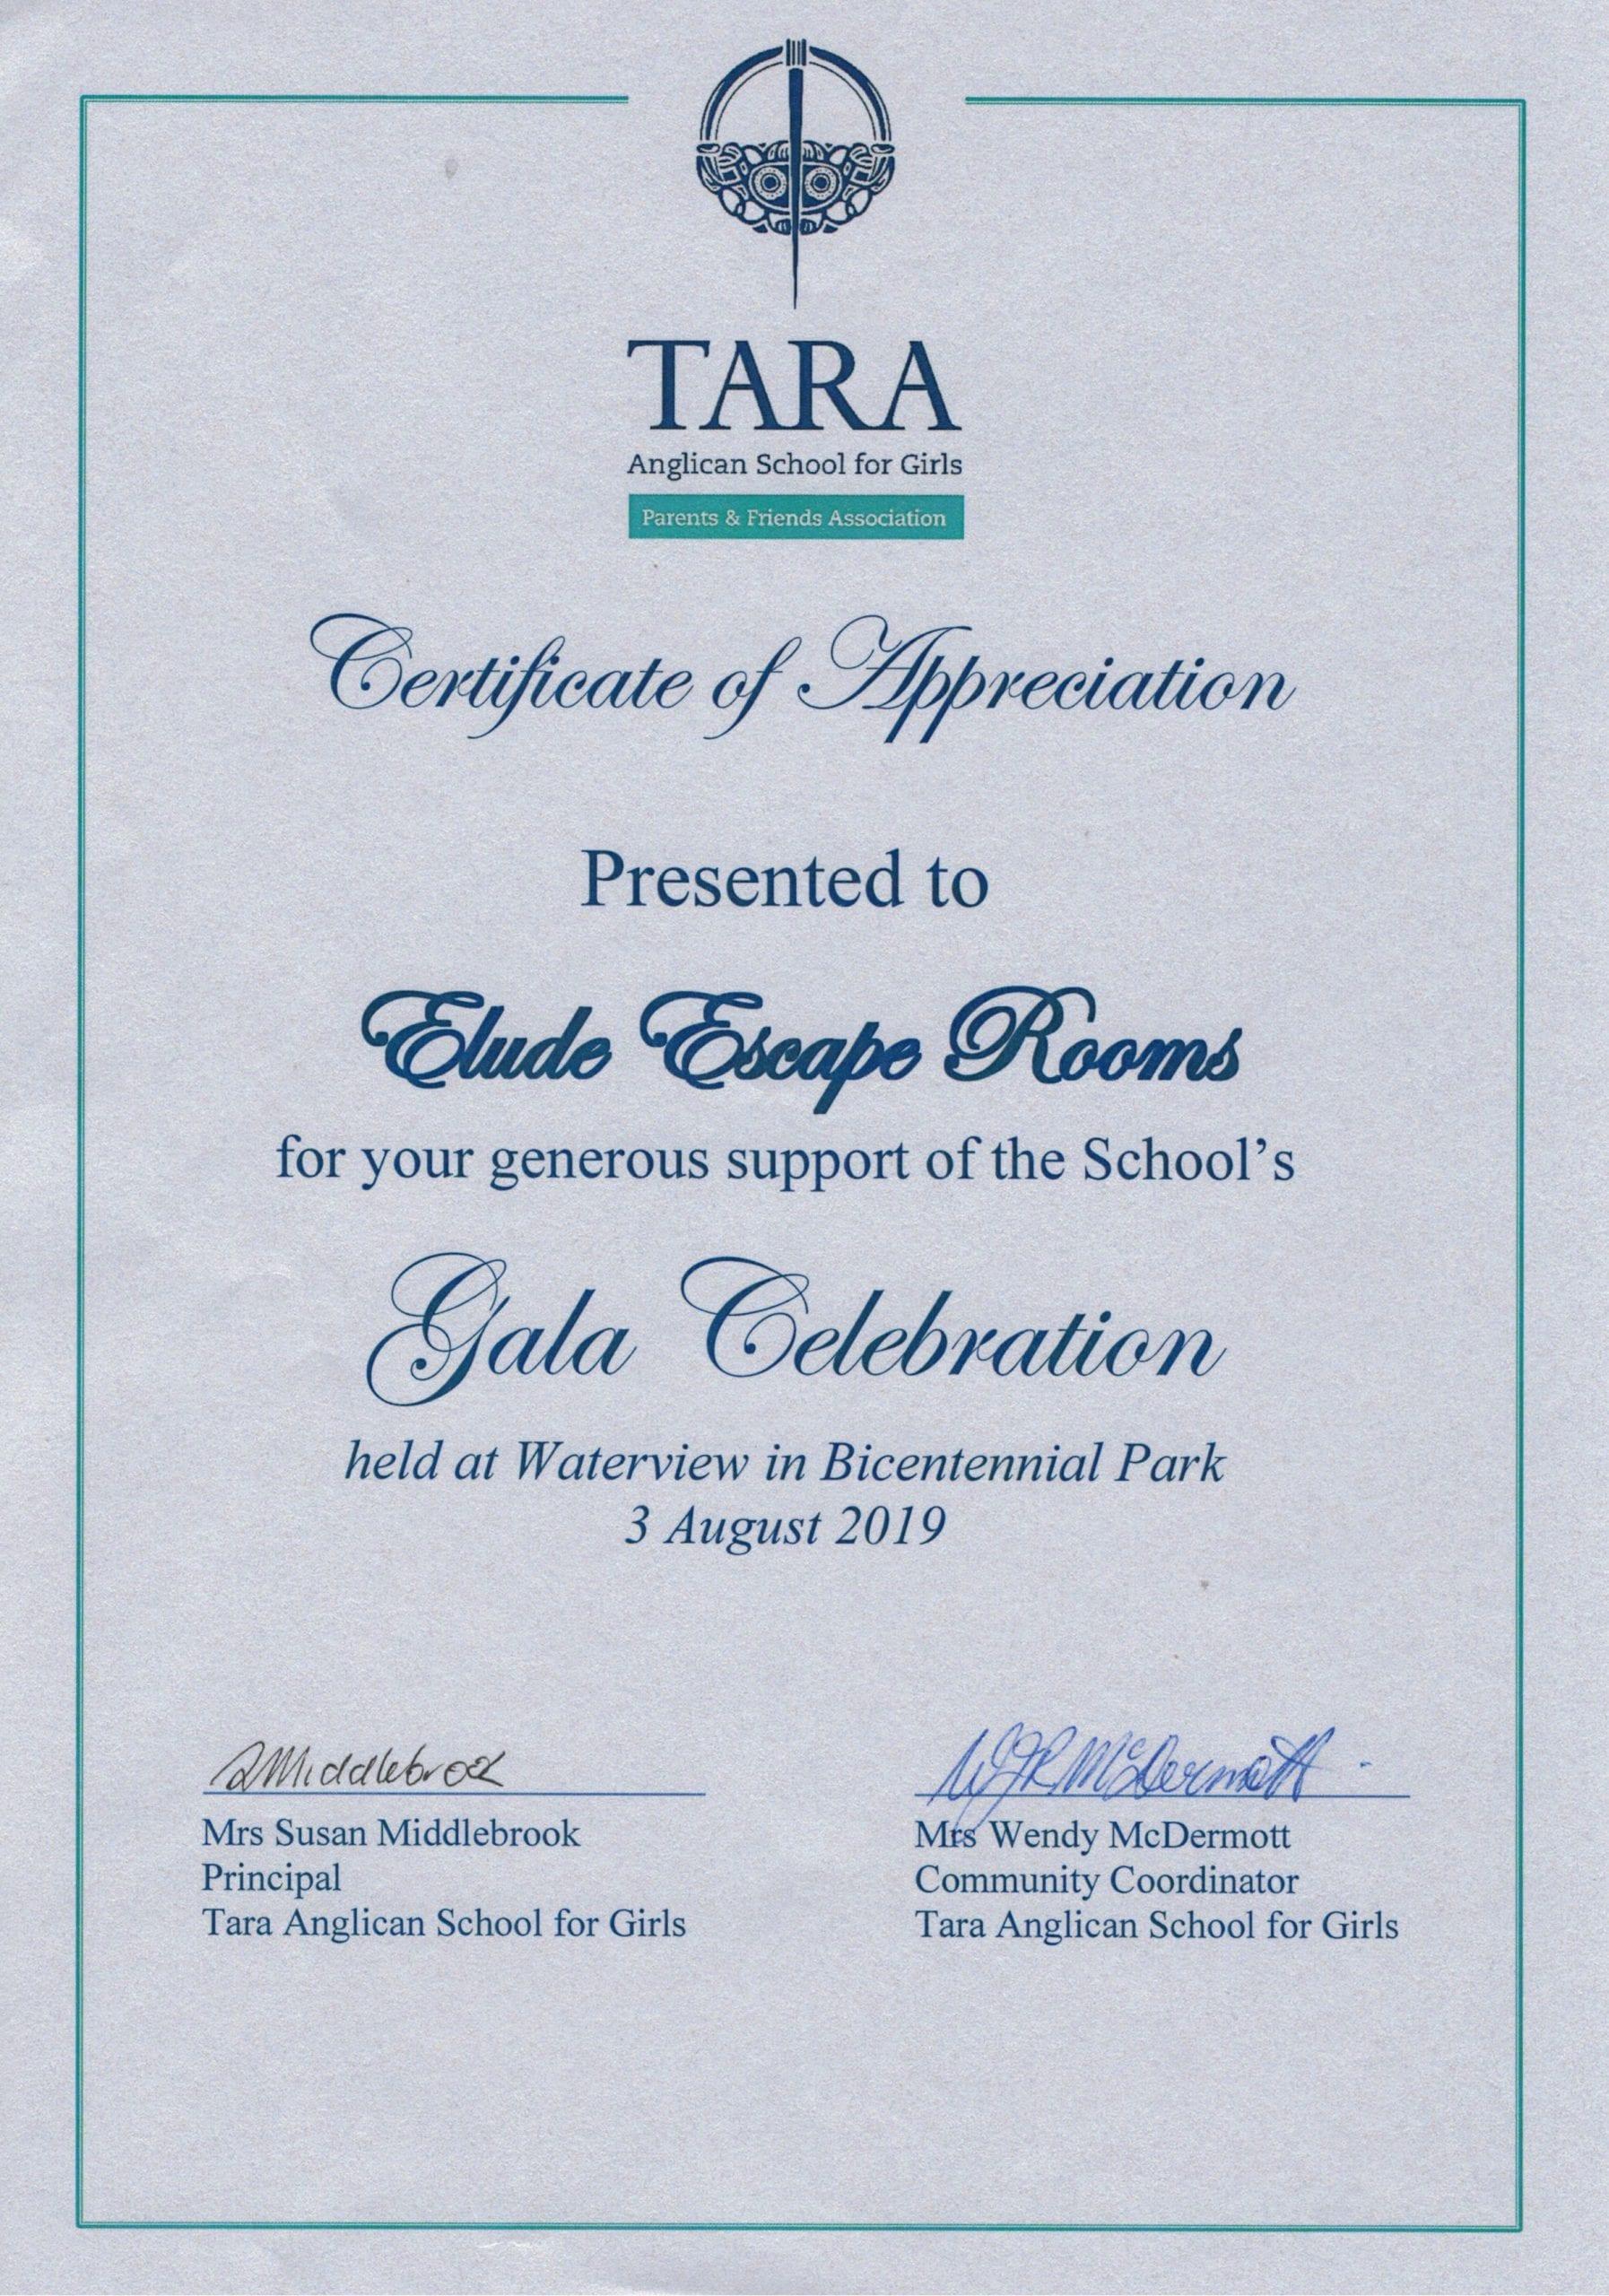 Certificate of Appreciation from Tara Anglican School